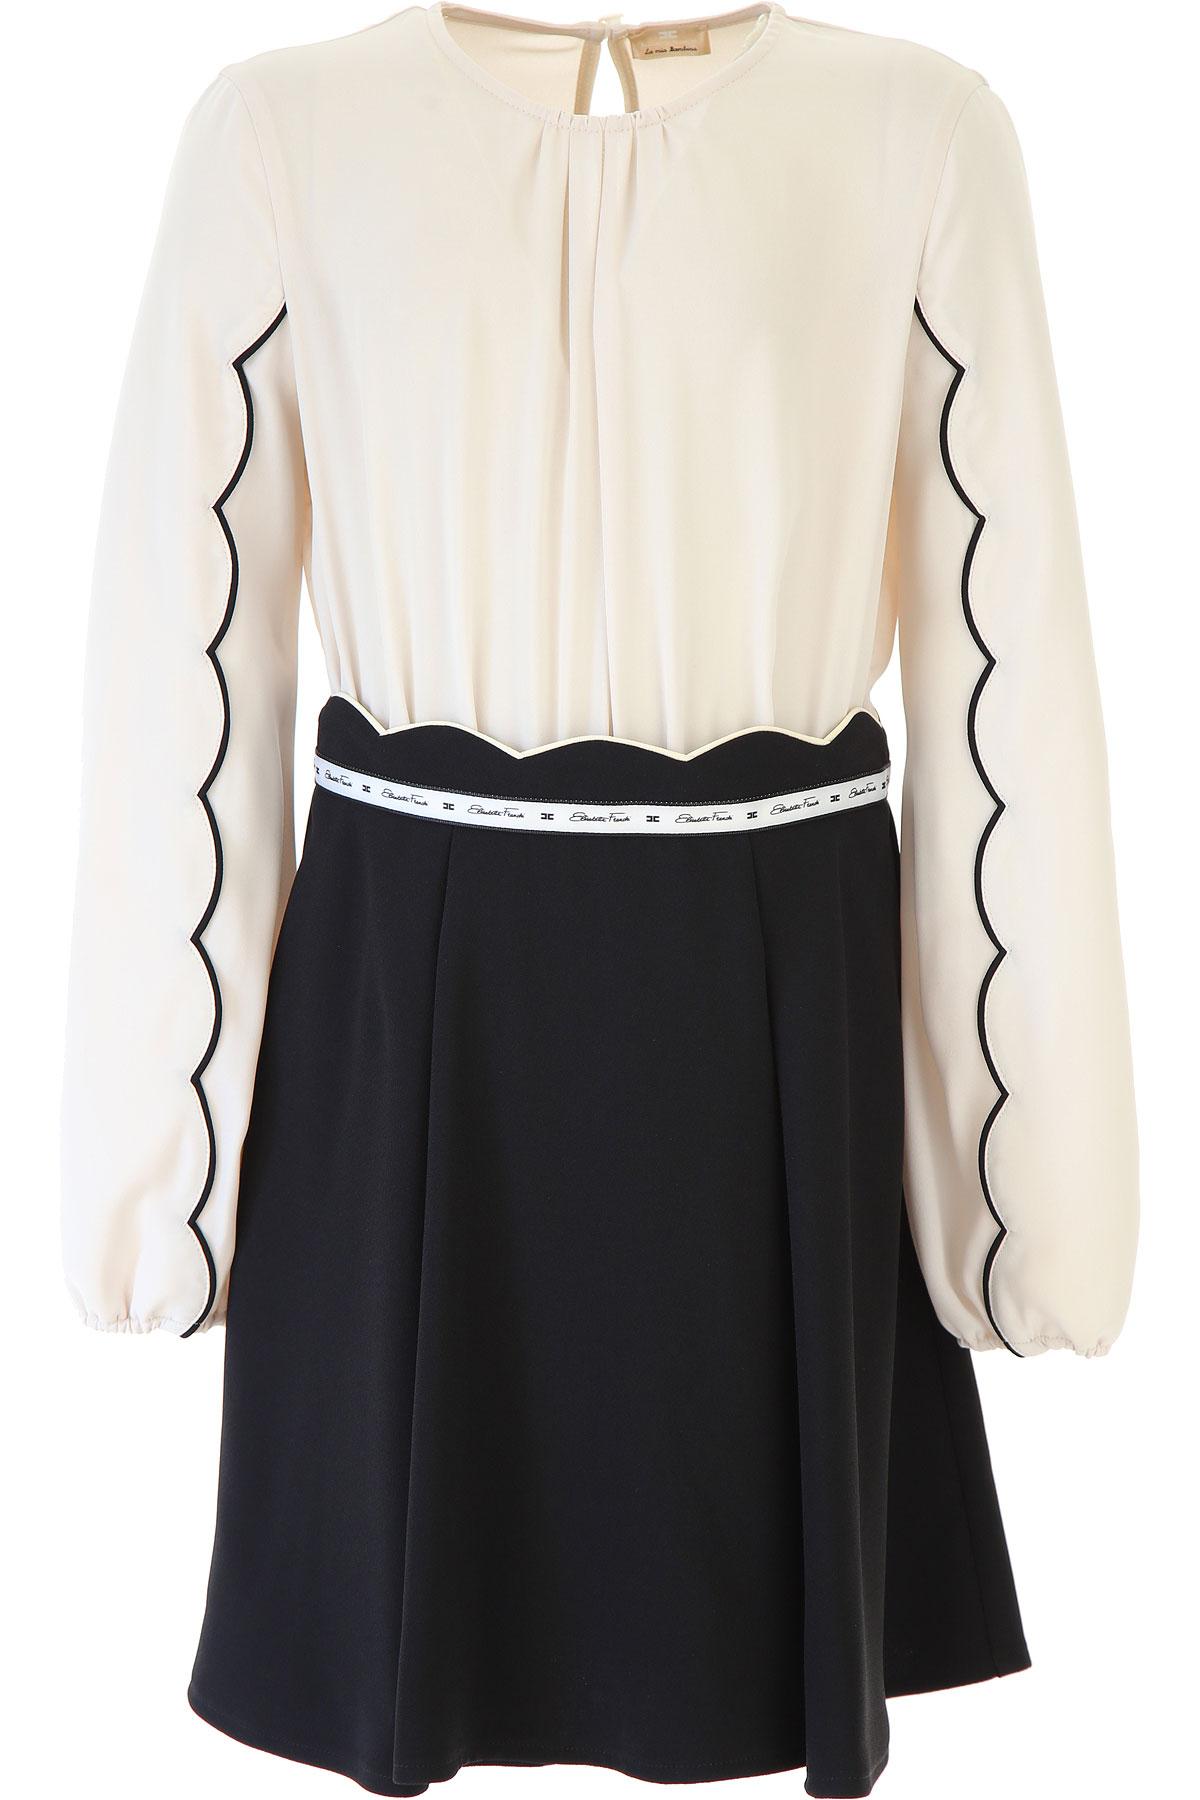 Elisabetta Franchi Girls Dress On Sale, Beige, polyester, 2019, L M S XL